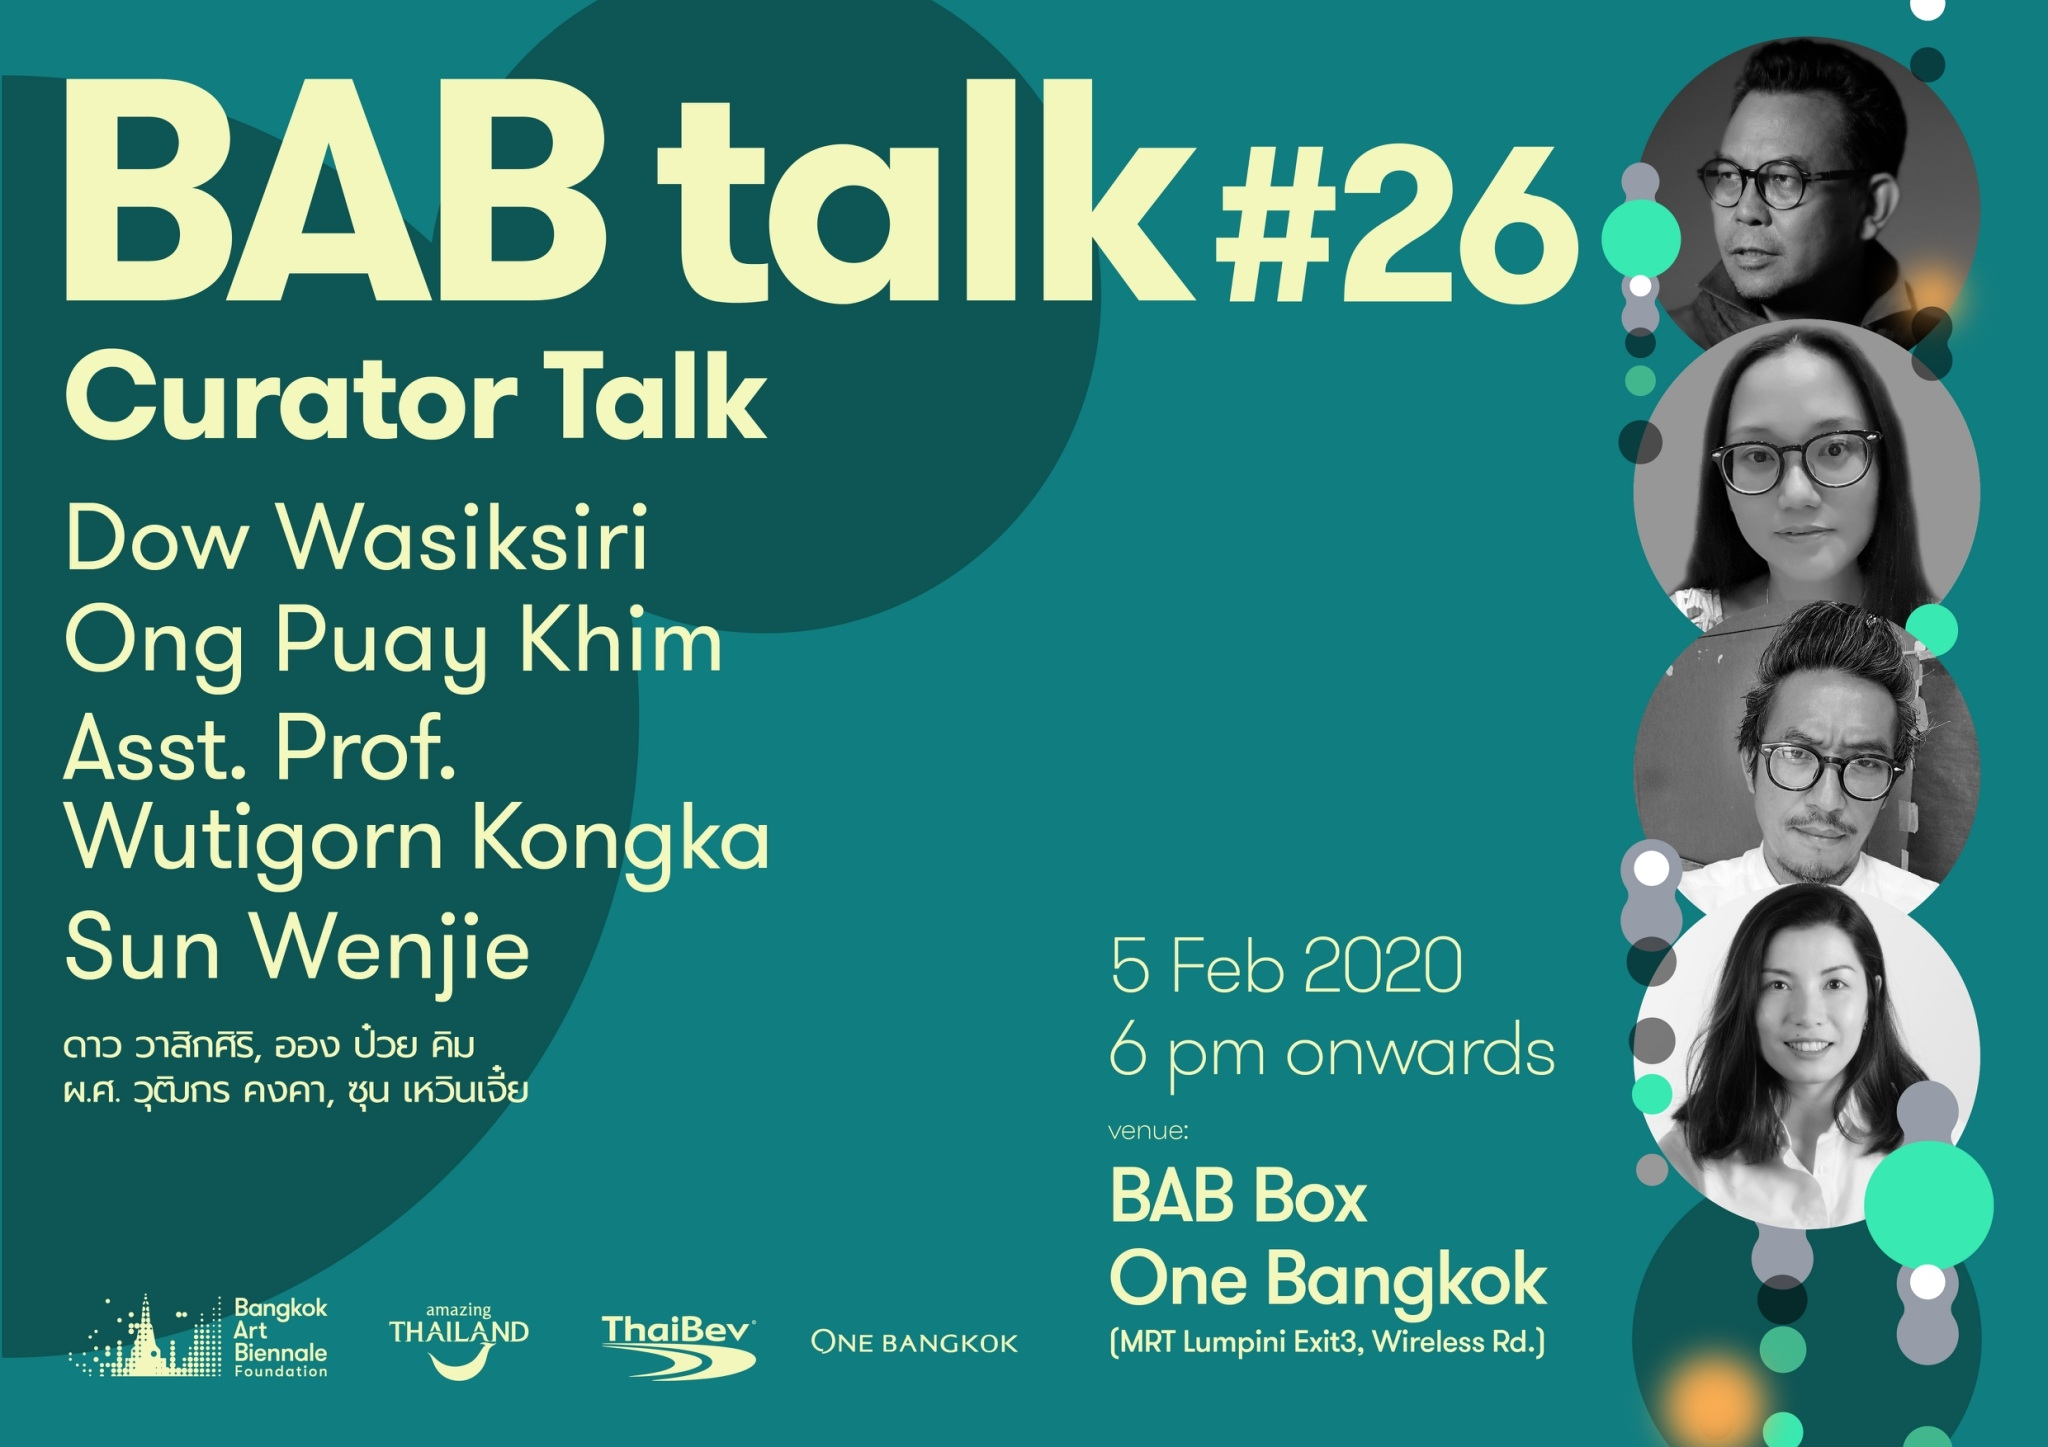 BAB Talk #26 - Curator Talk